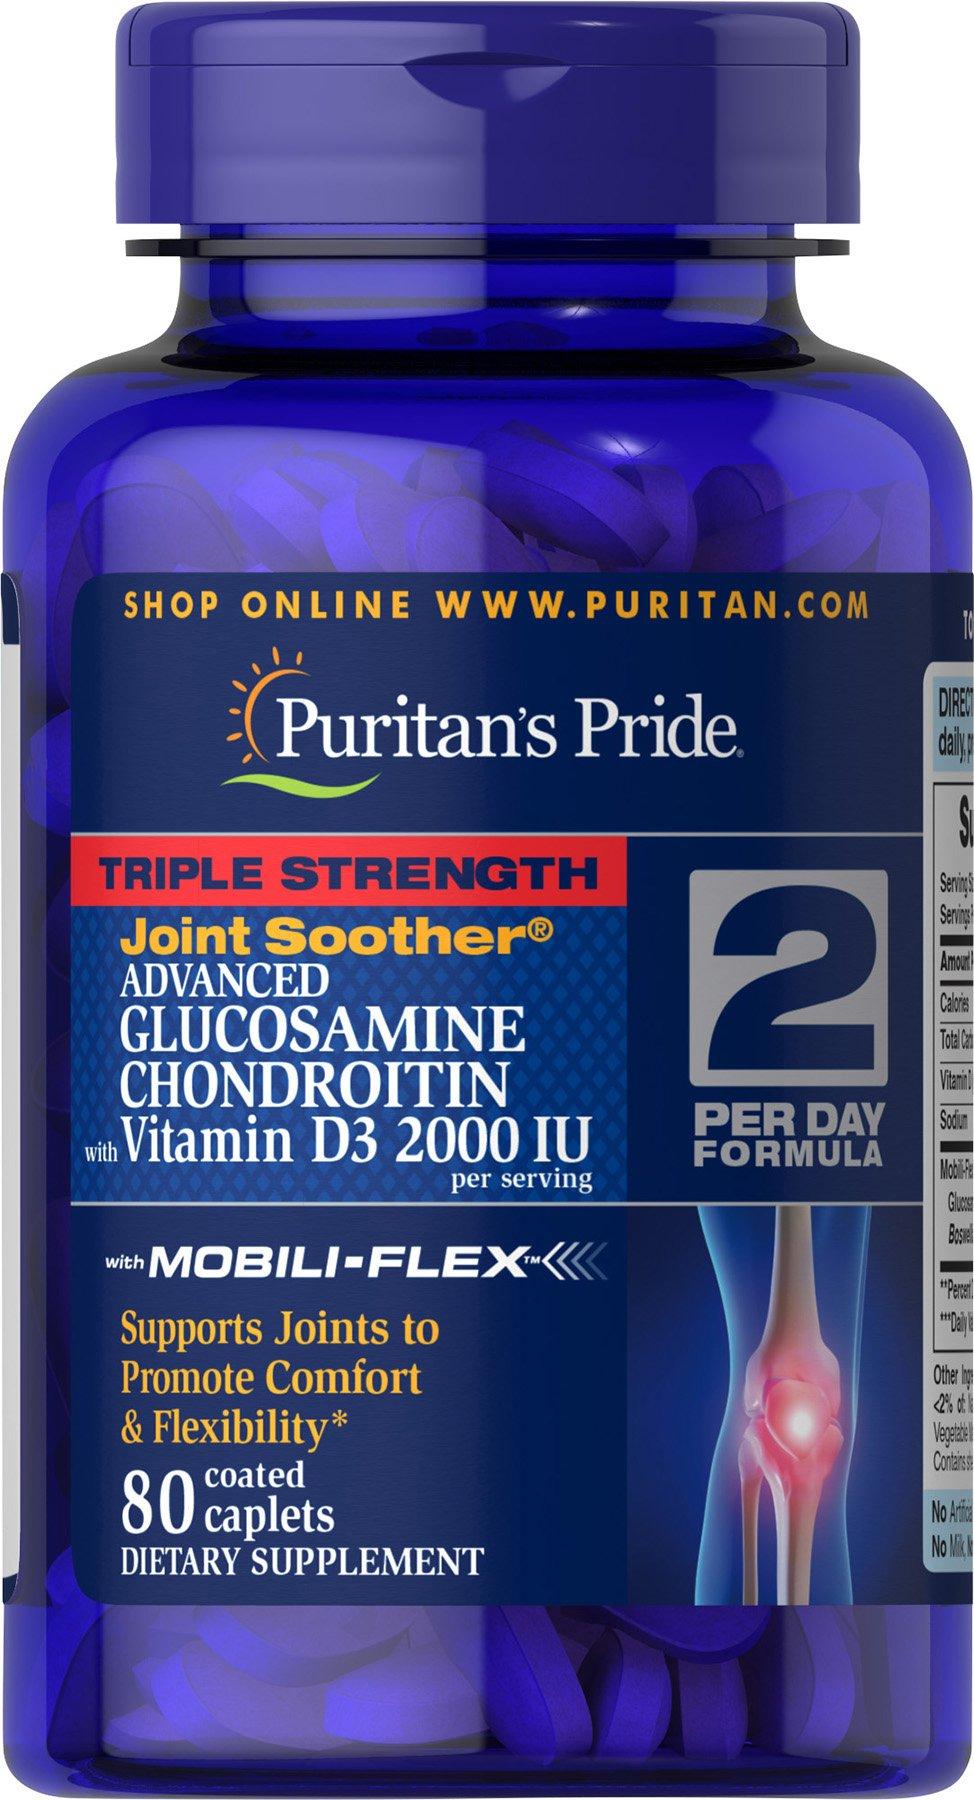 Puritan's Pride Triple Strength Glucosamine Chondroitin with Vitamin D3 and Boswellia Serrata Extract, 2,000IU per serving, 80 Coated Caplets